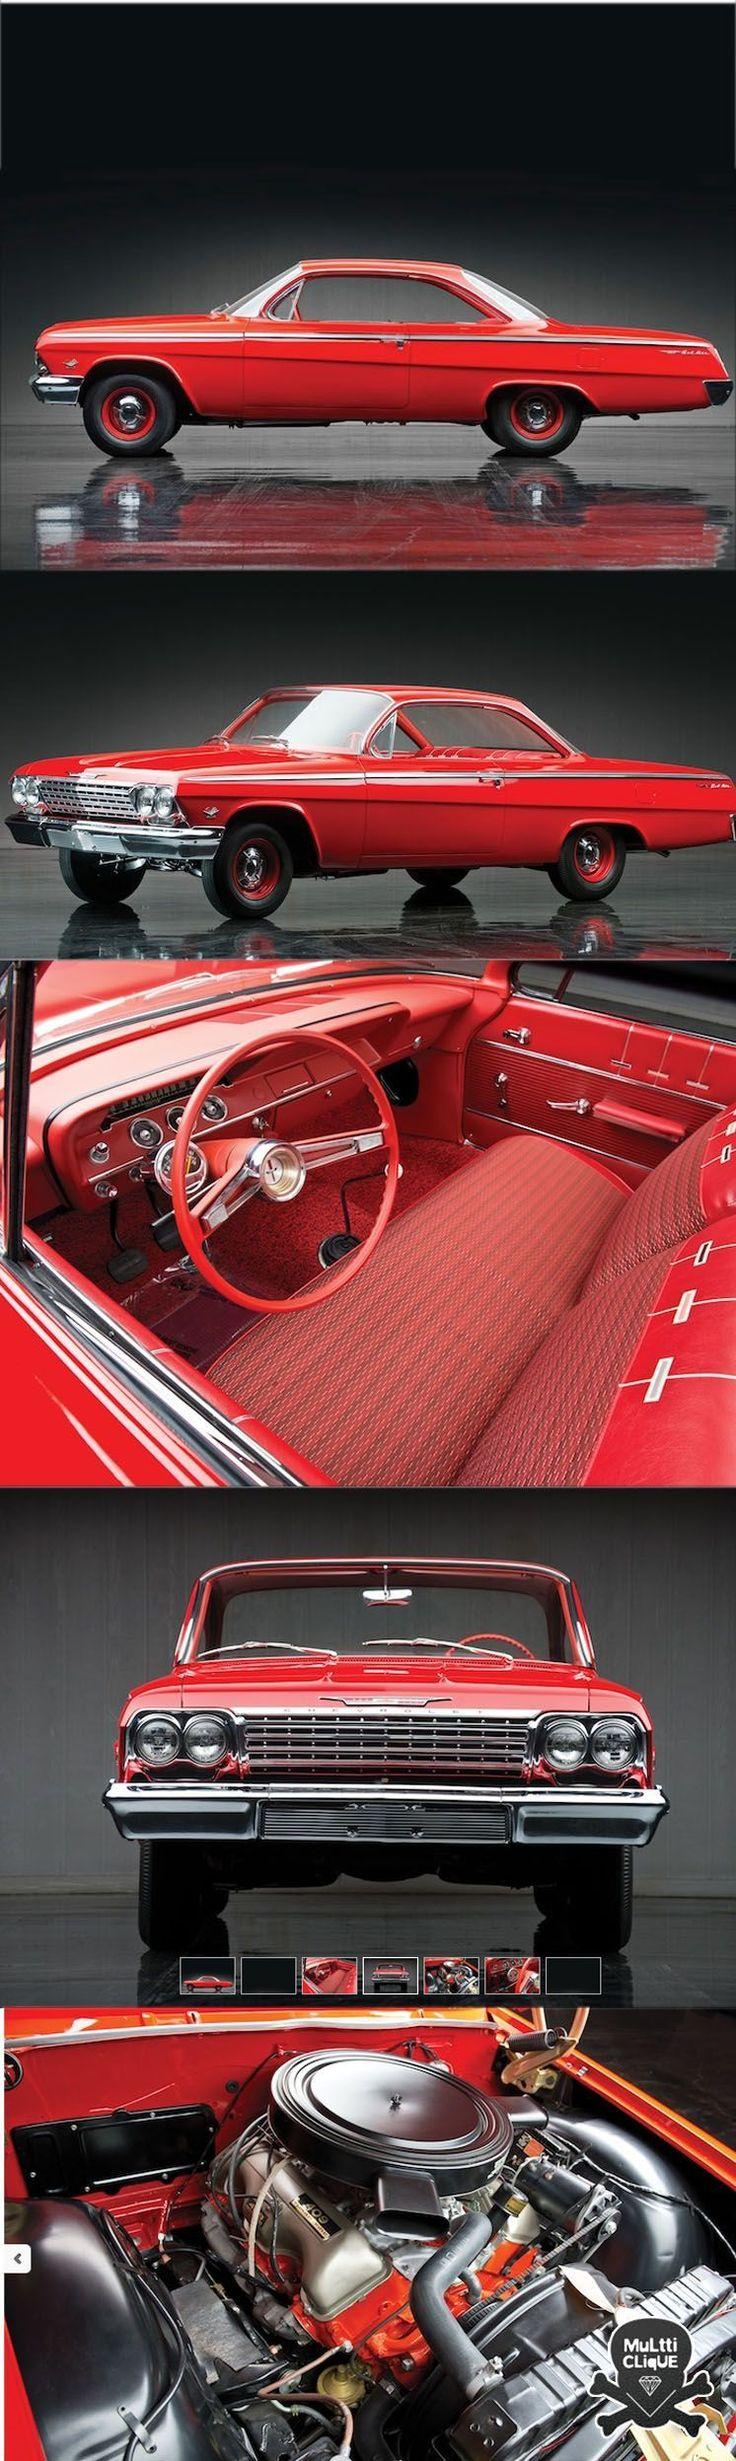 1962 Chevrolet Bel Air Sport Coupe #chevroletimpala1962 #Chevroletchevelle